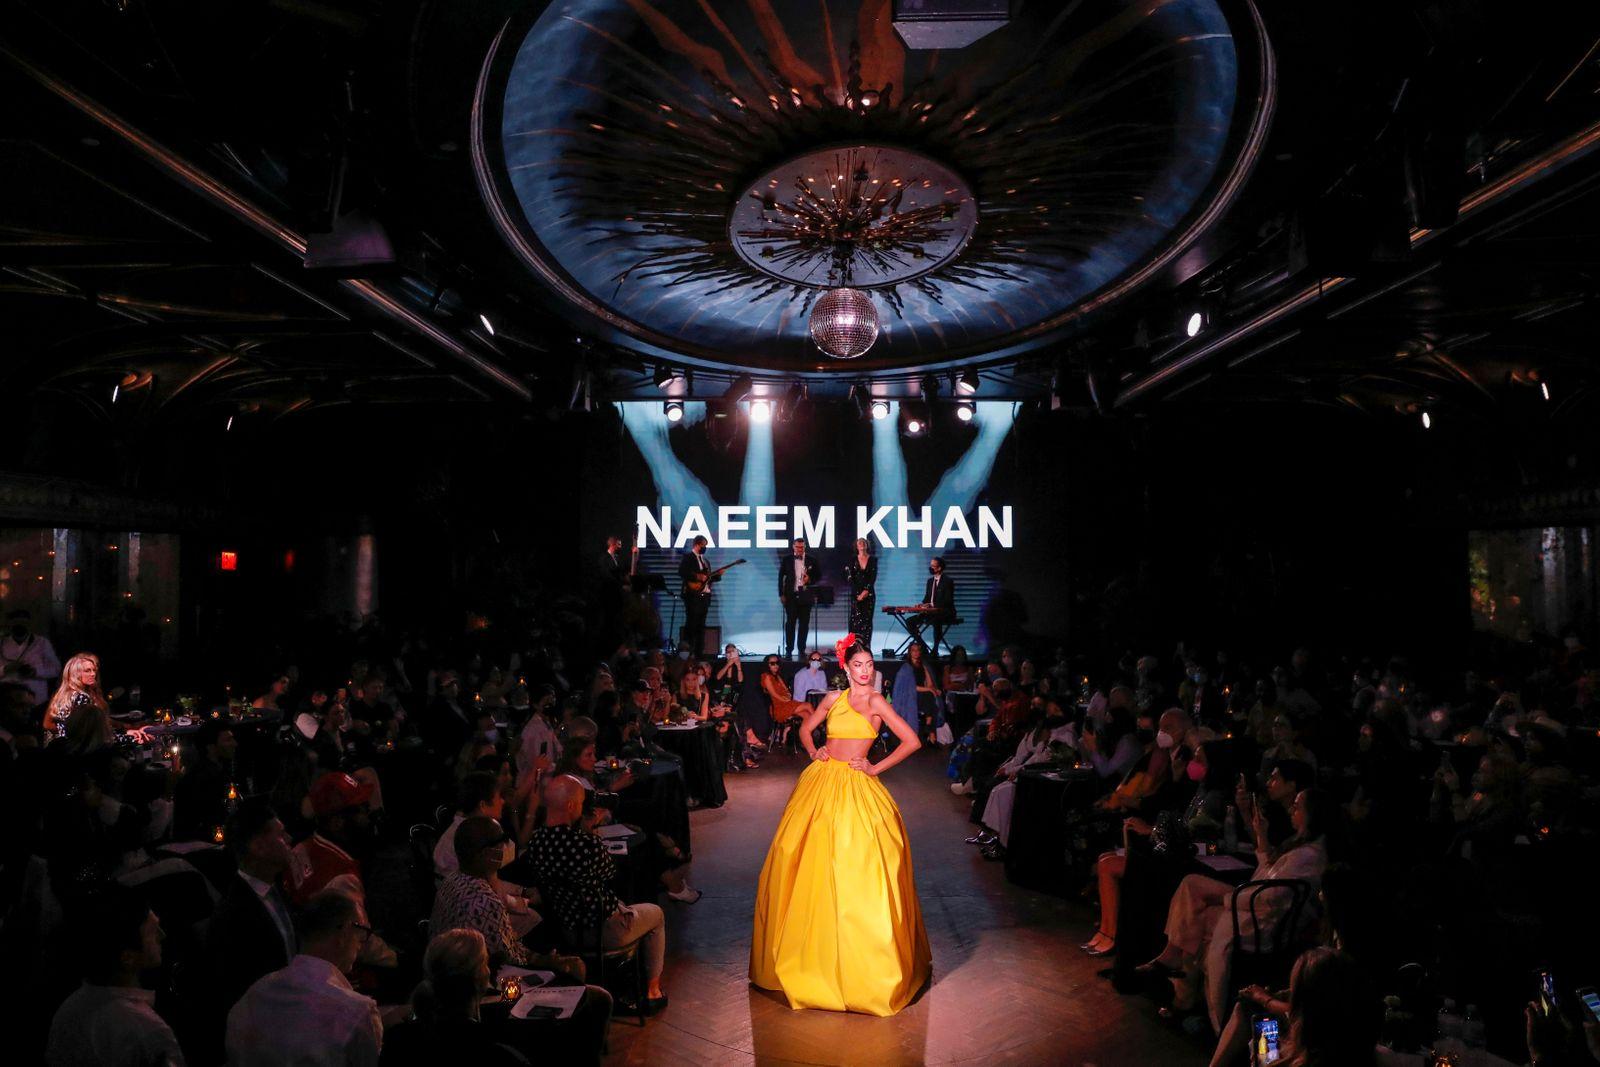 Naeem Khan Spring/Summer 2022 collection during New York Fashion Week in Manhattan, New York City